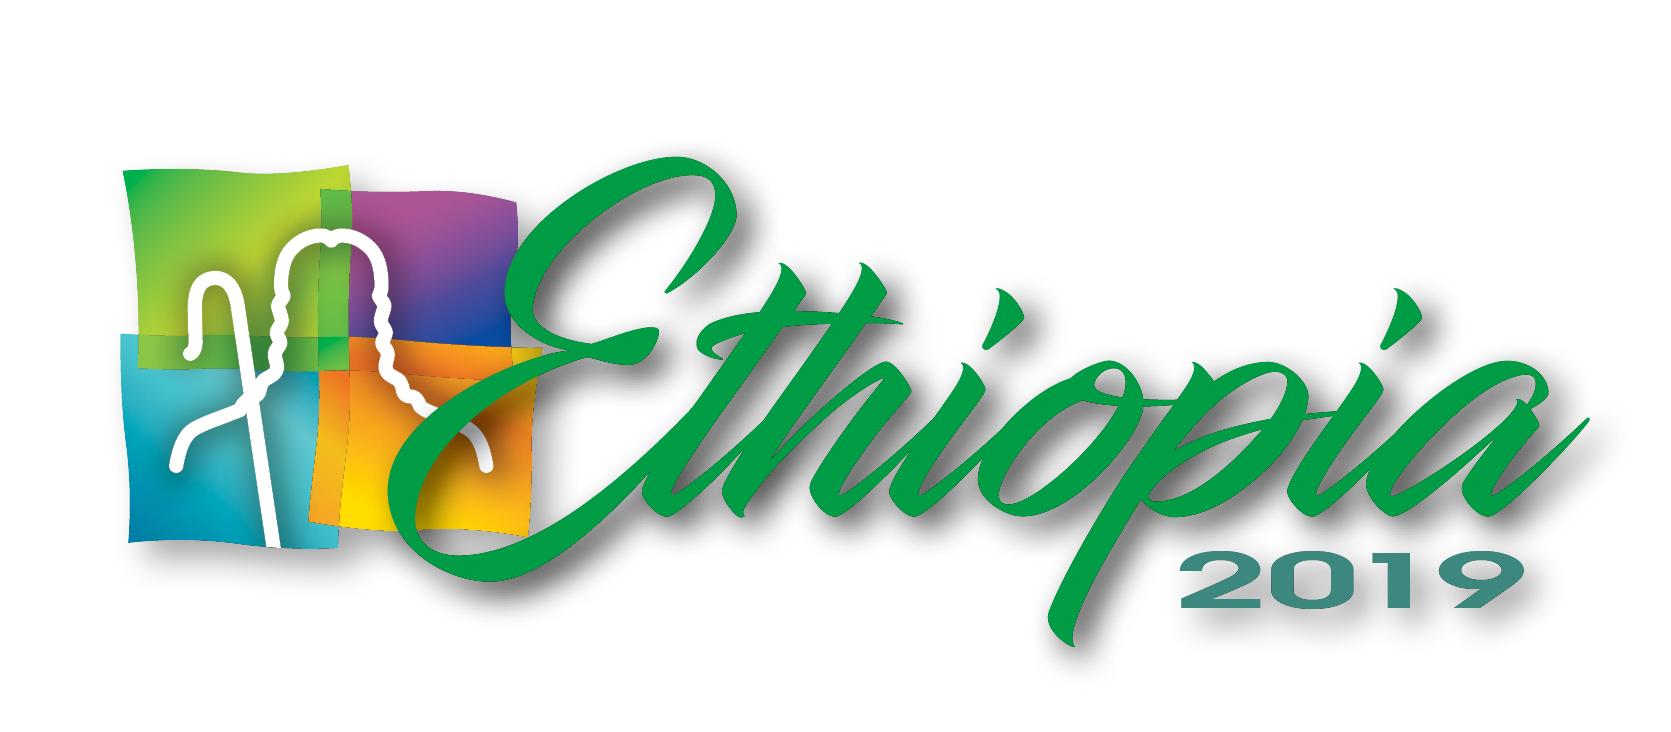 Ethiopian 2019 without photo.jpg